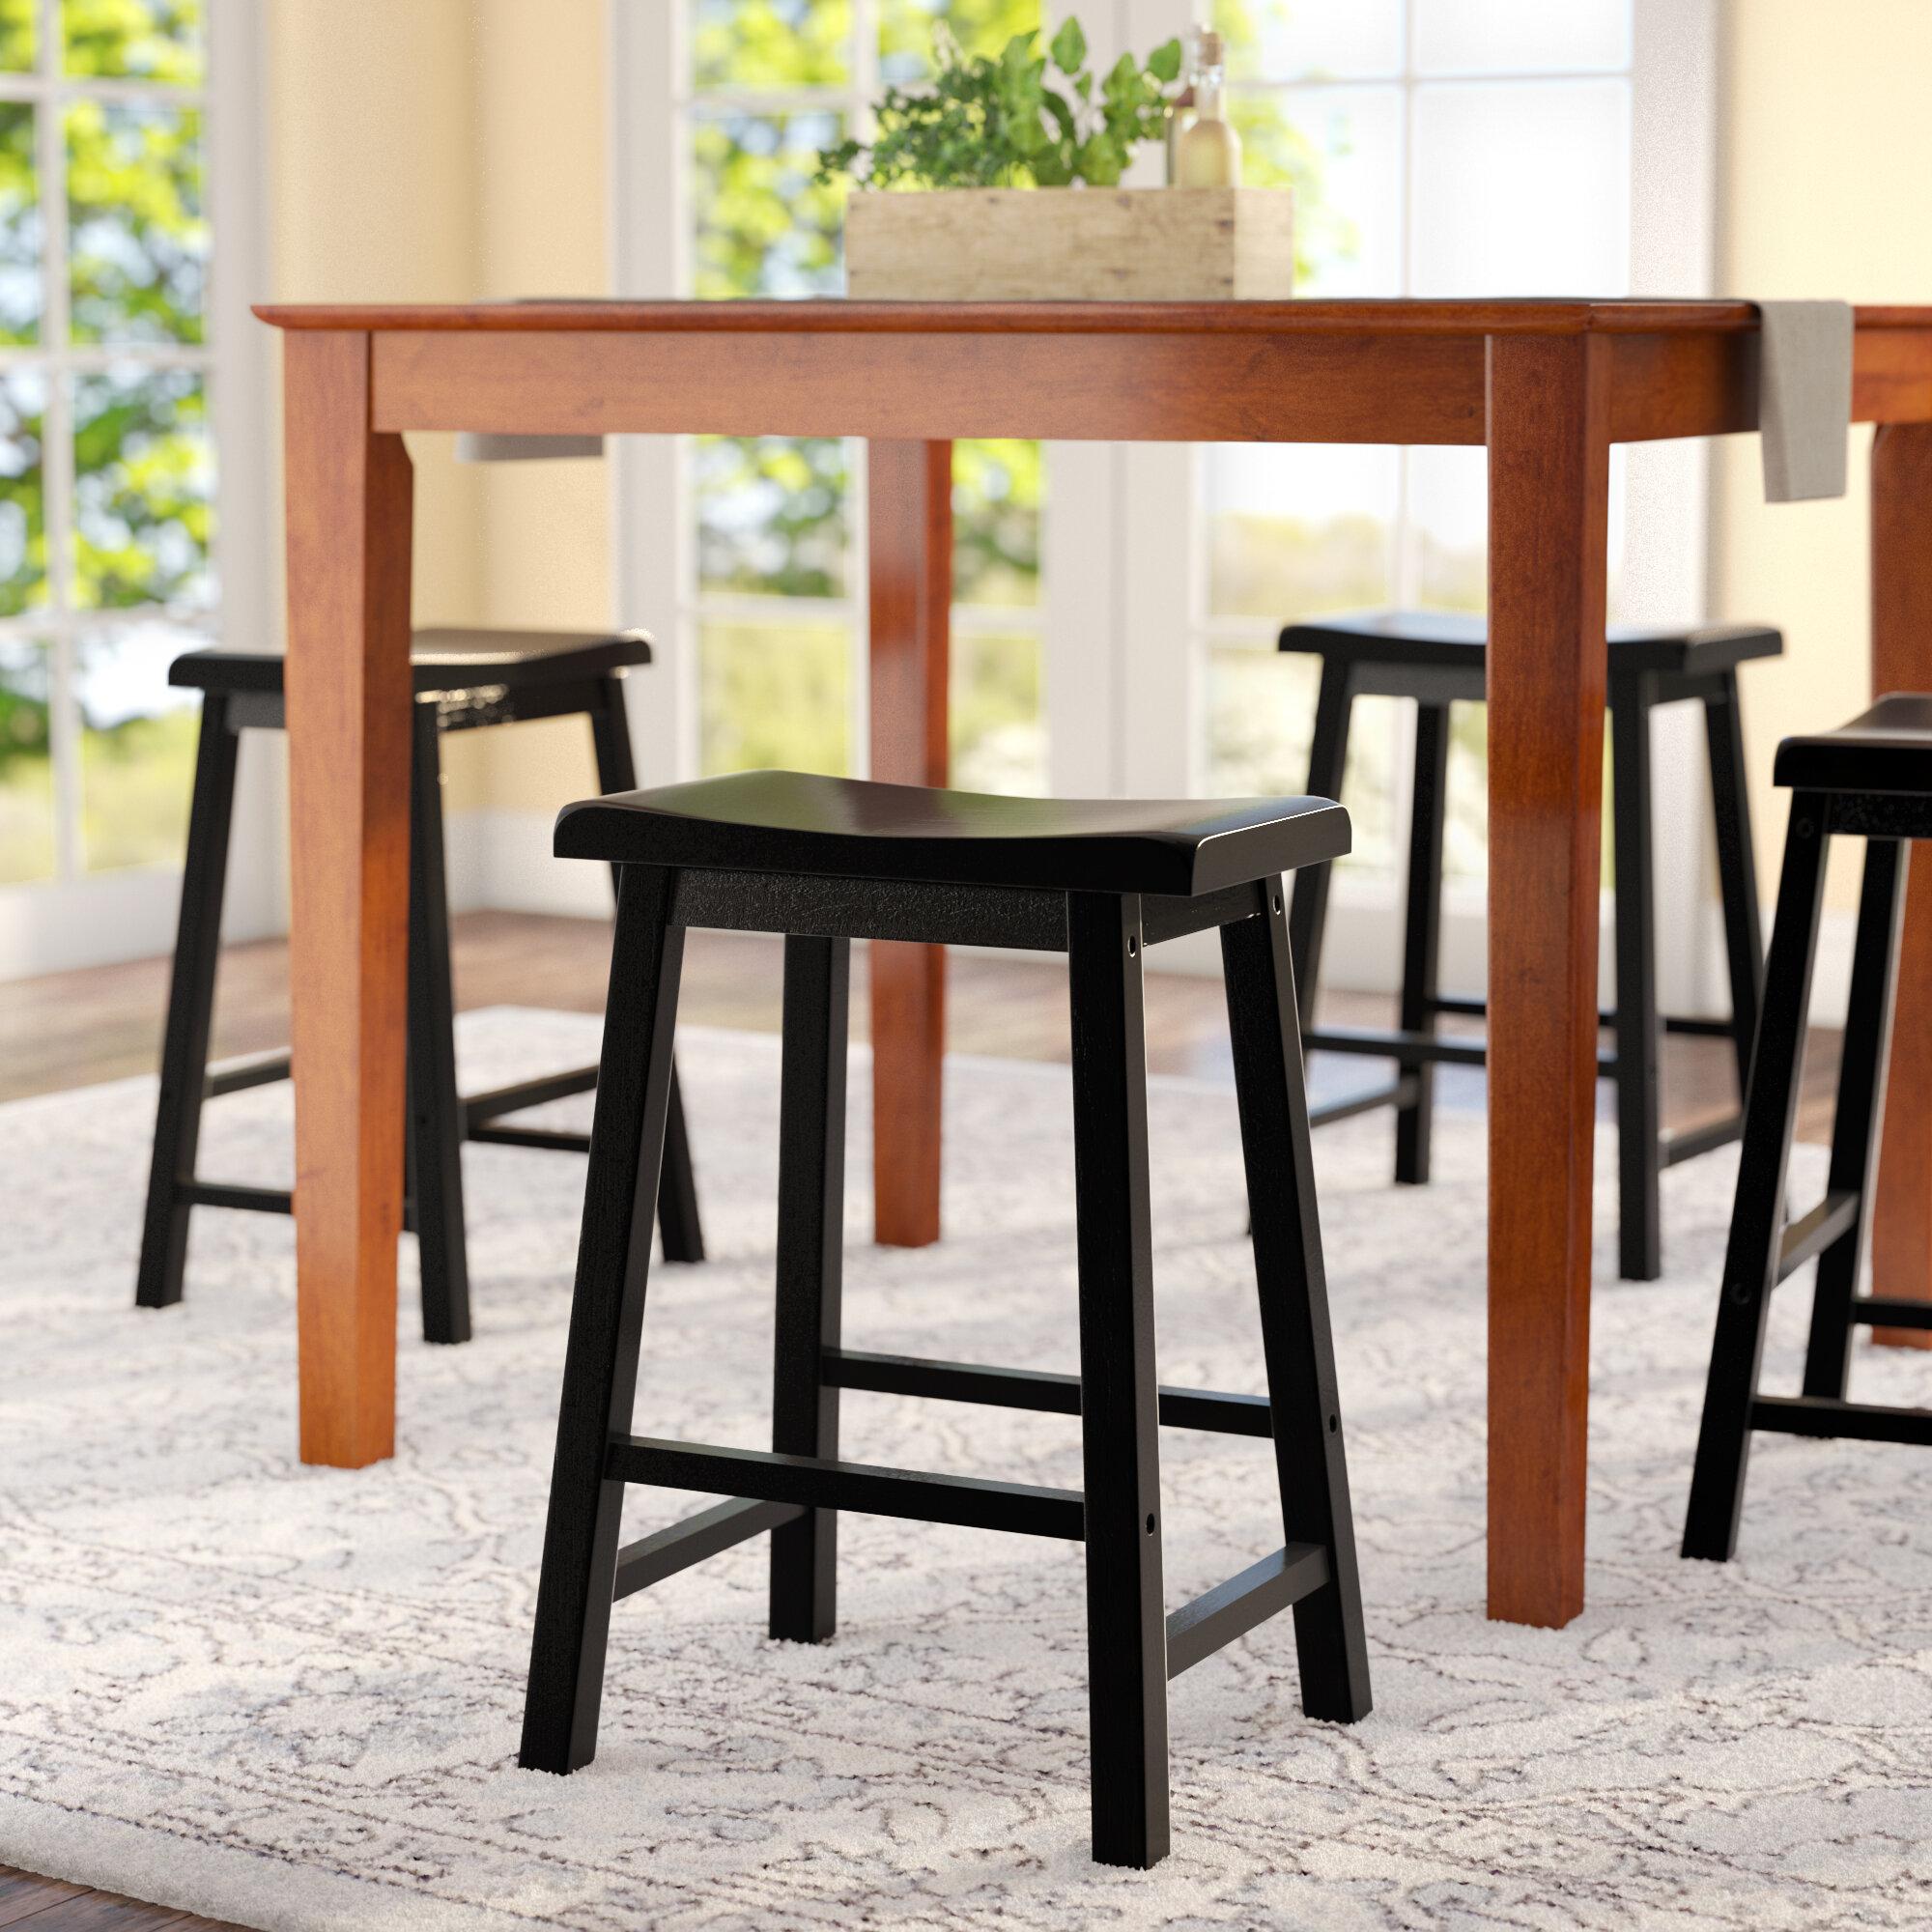 Fabulous Whitworth 5 Piece Pub Table Set Customarchery Wood Chair Design Ideas Customarcherynet